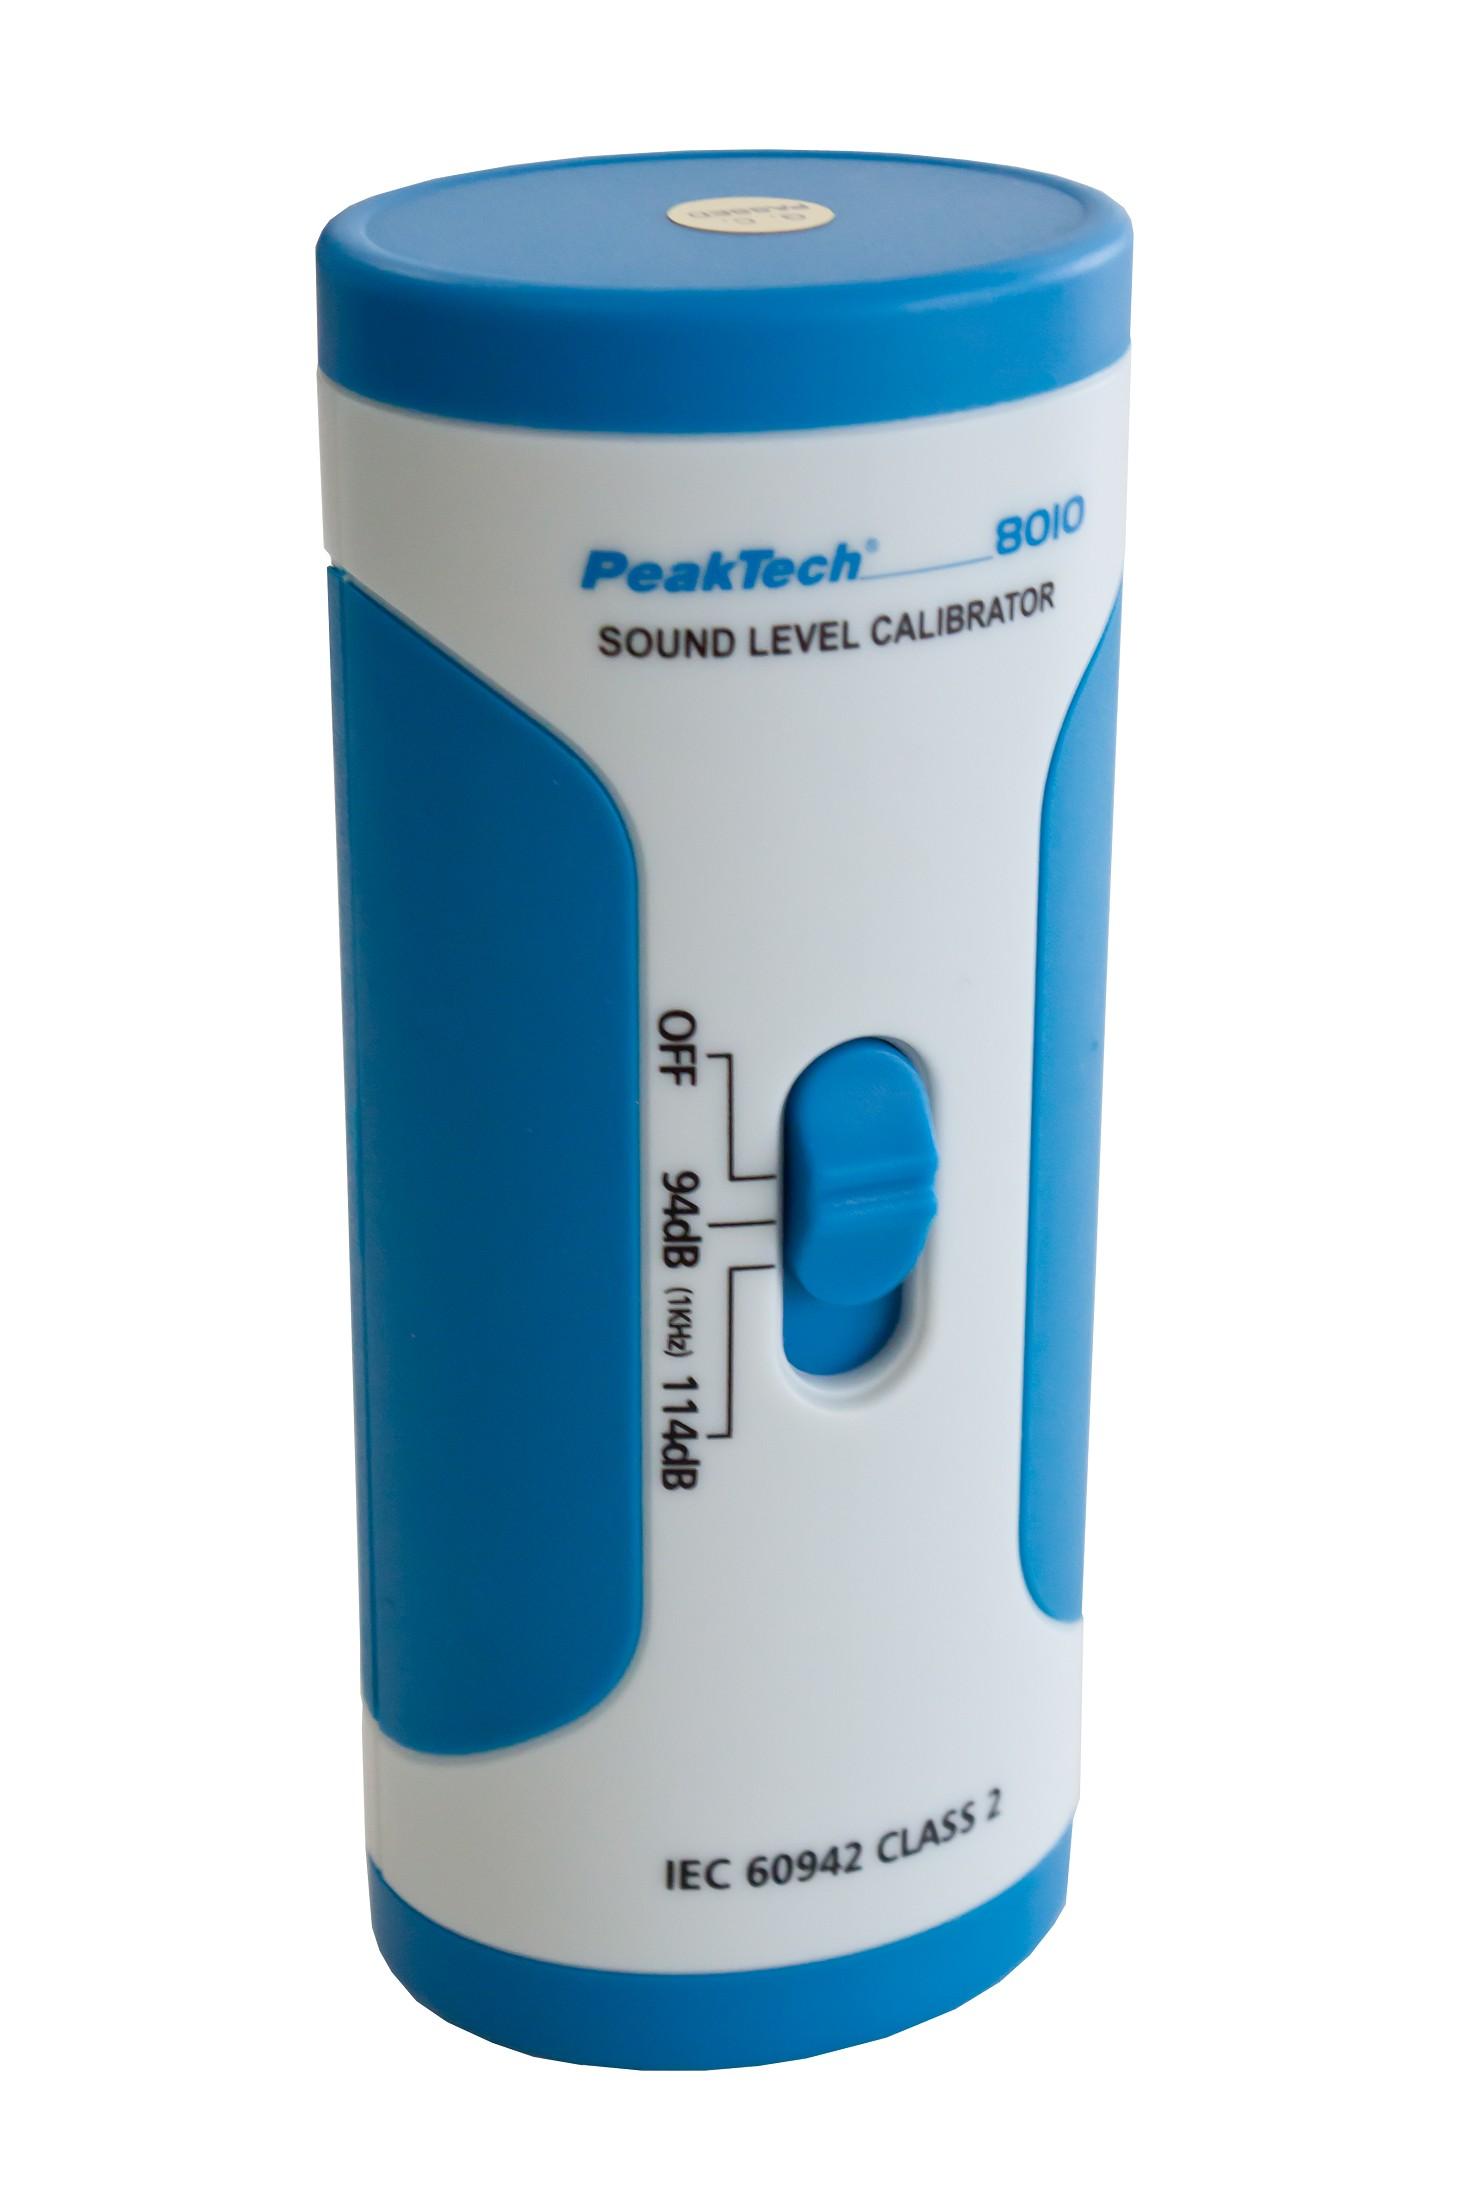 «PeakTech® P 8010» Sound Level Calibrator, 94 dB/114 dB